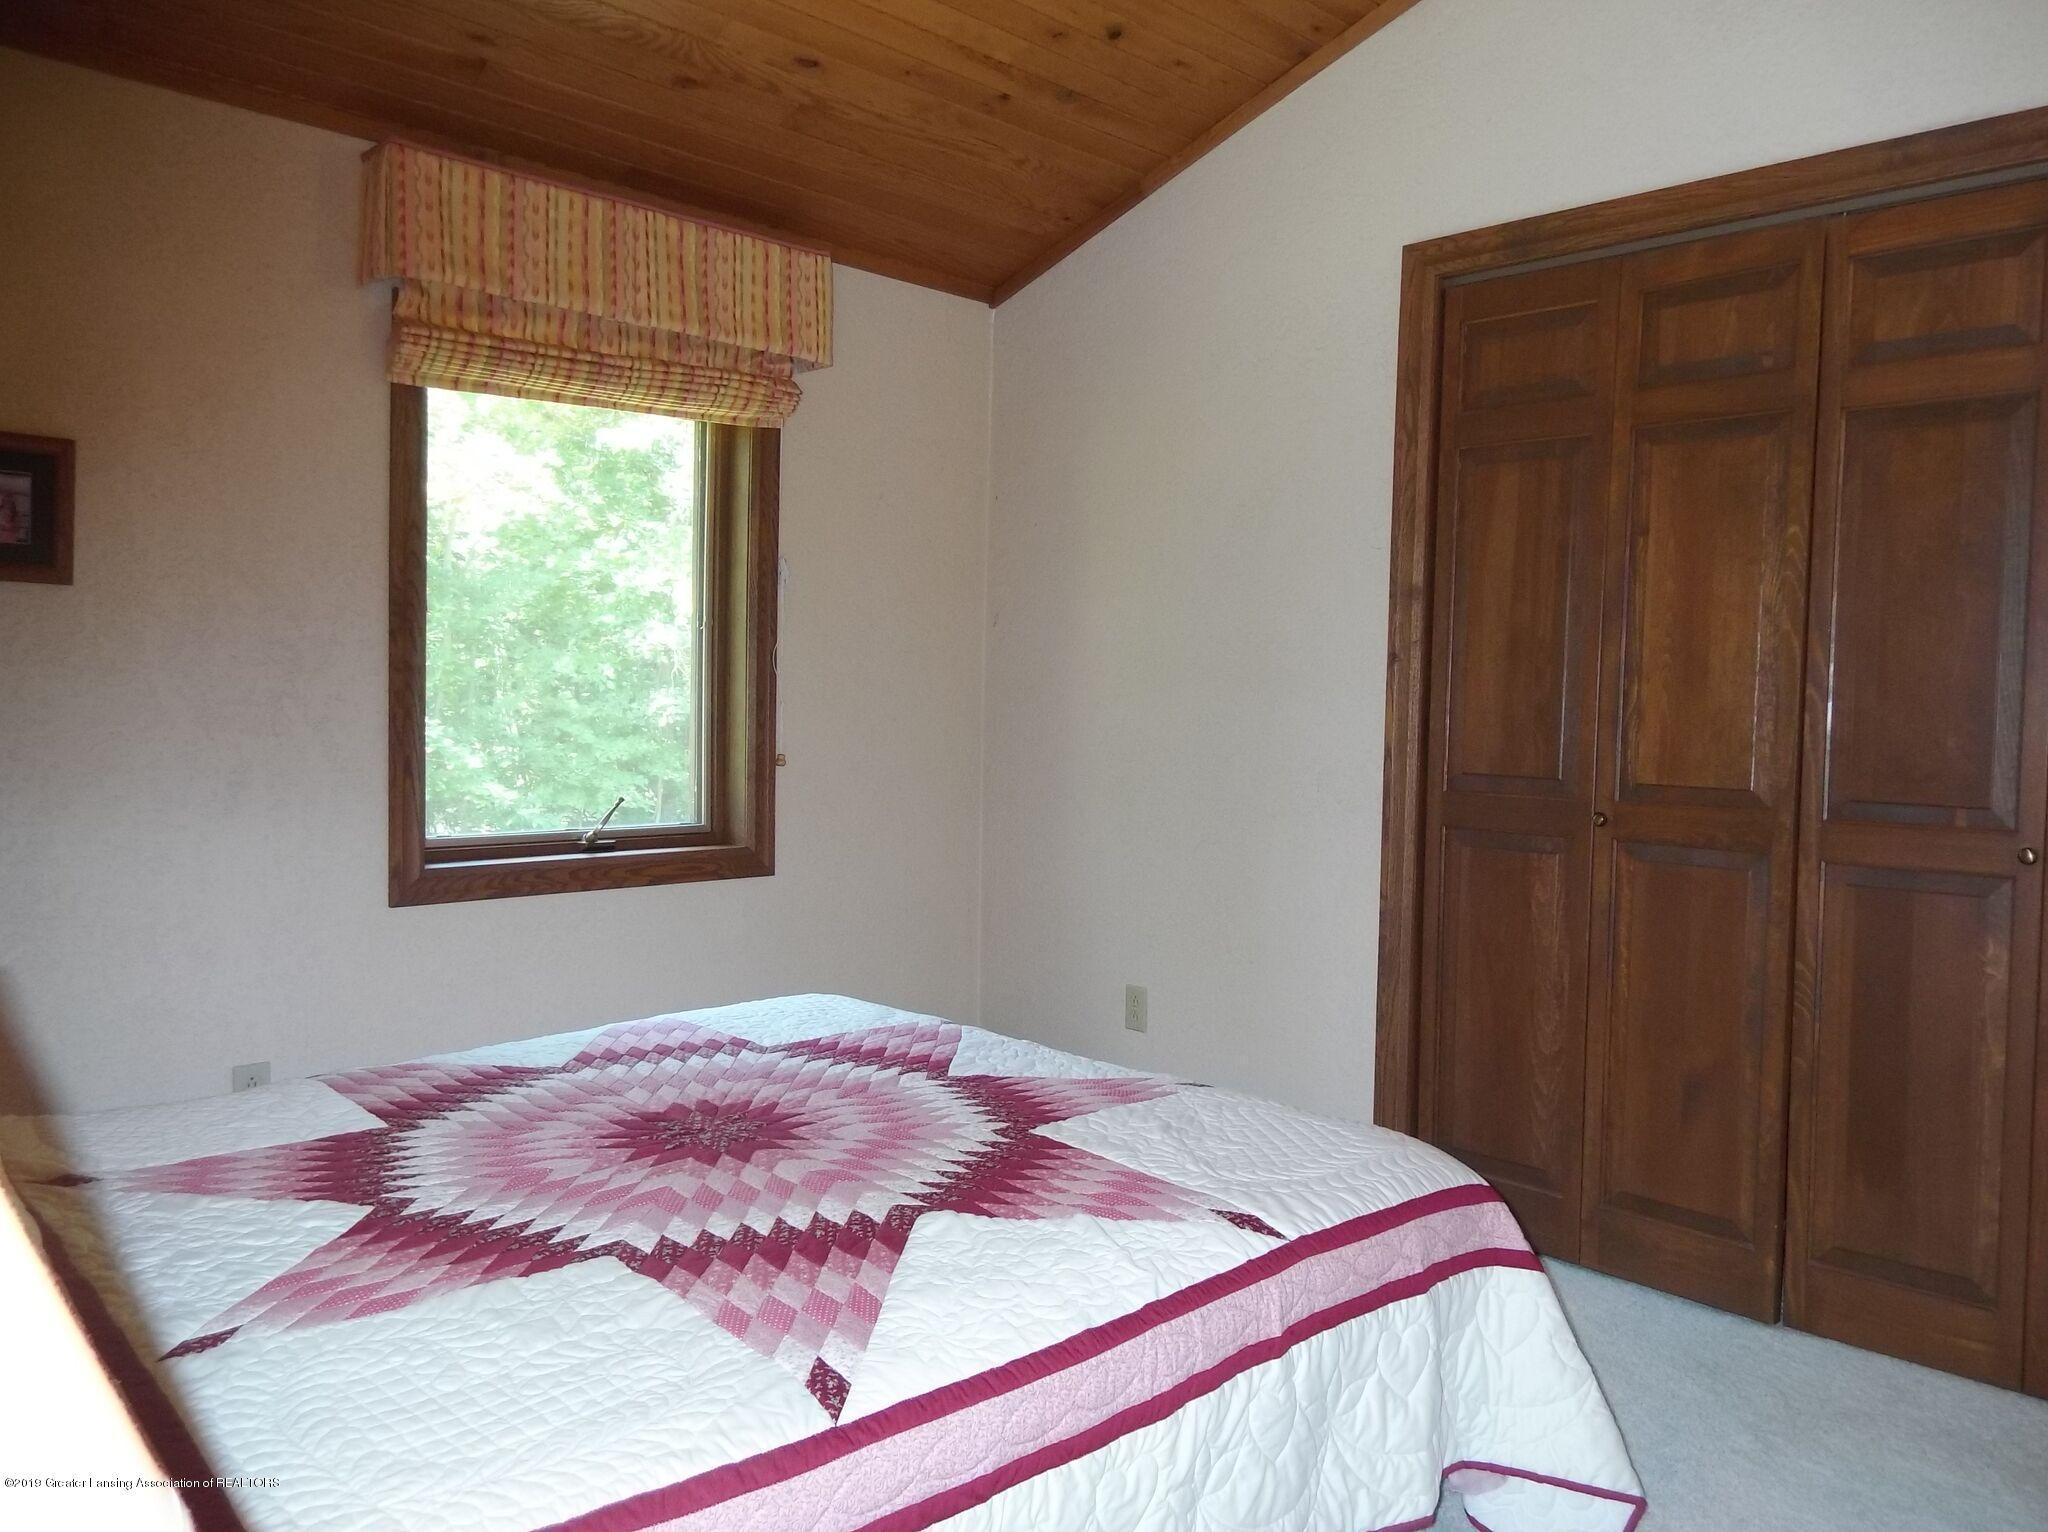 8144 Corrison Rd - Bedroom - 22